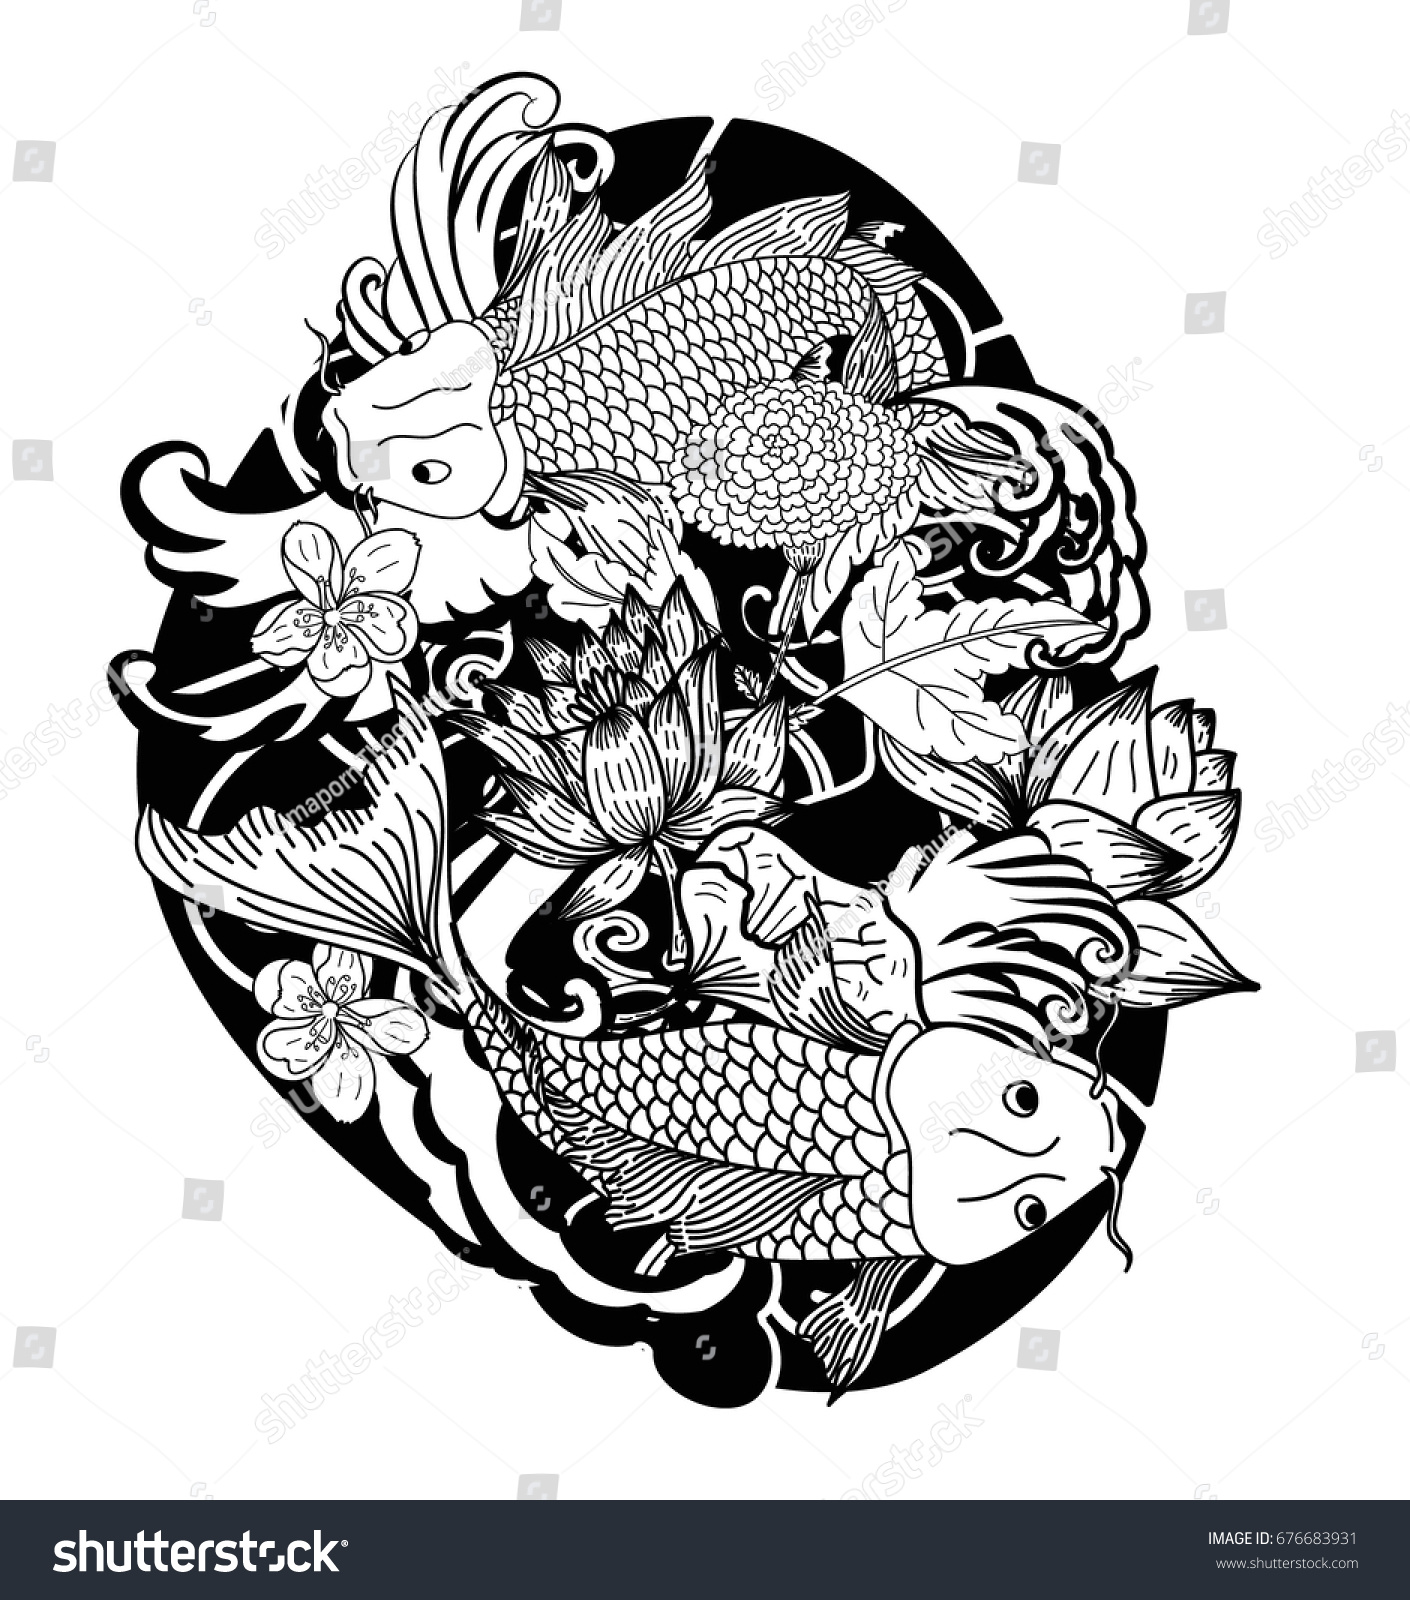 Beautiful Line Art Koi Carp Tattoo Design Black And White Koi Fish